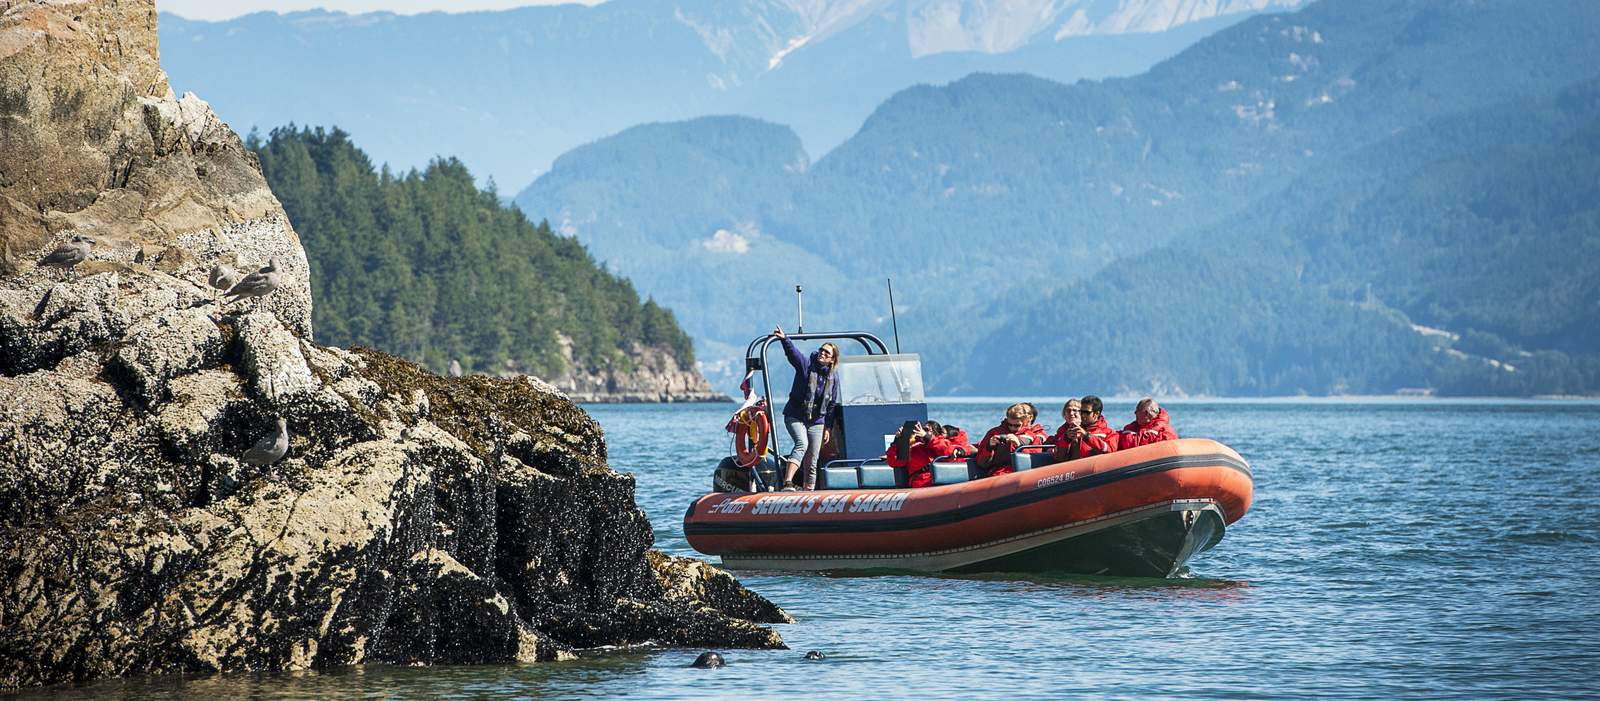 Seawell's Marinas Sea Safari in Vancouver, British Columbia